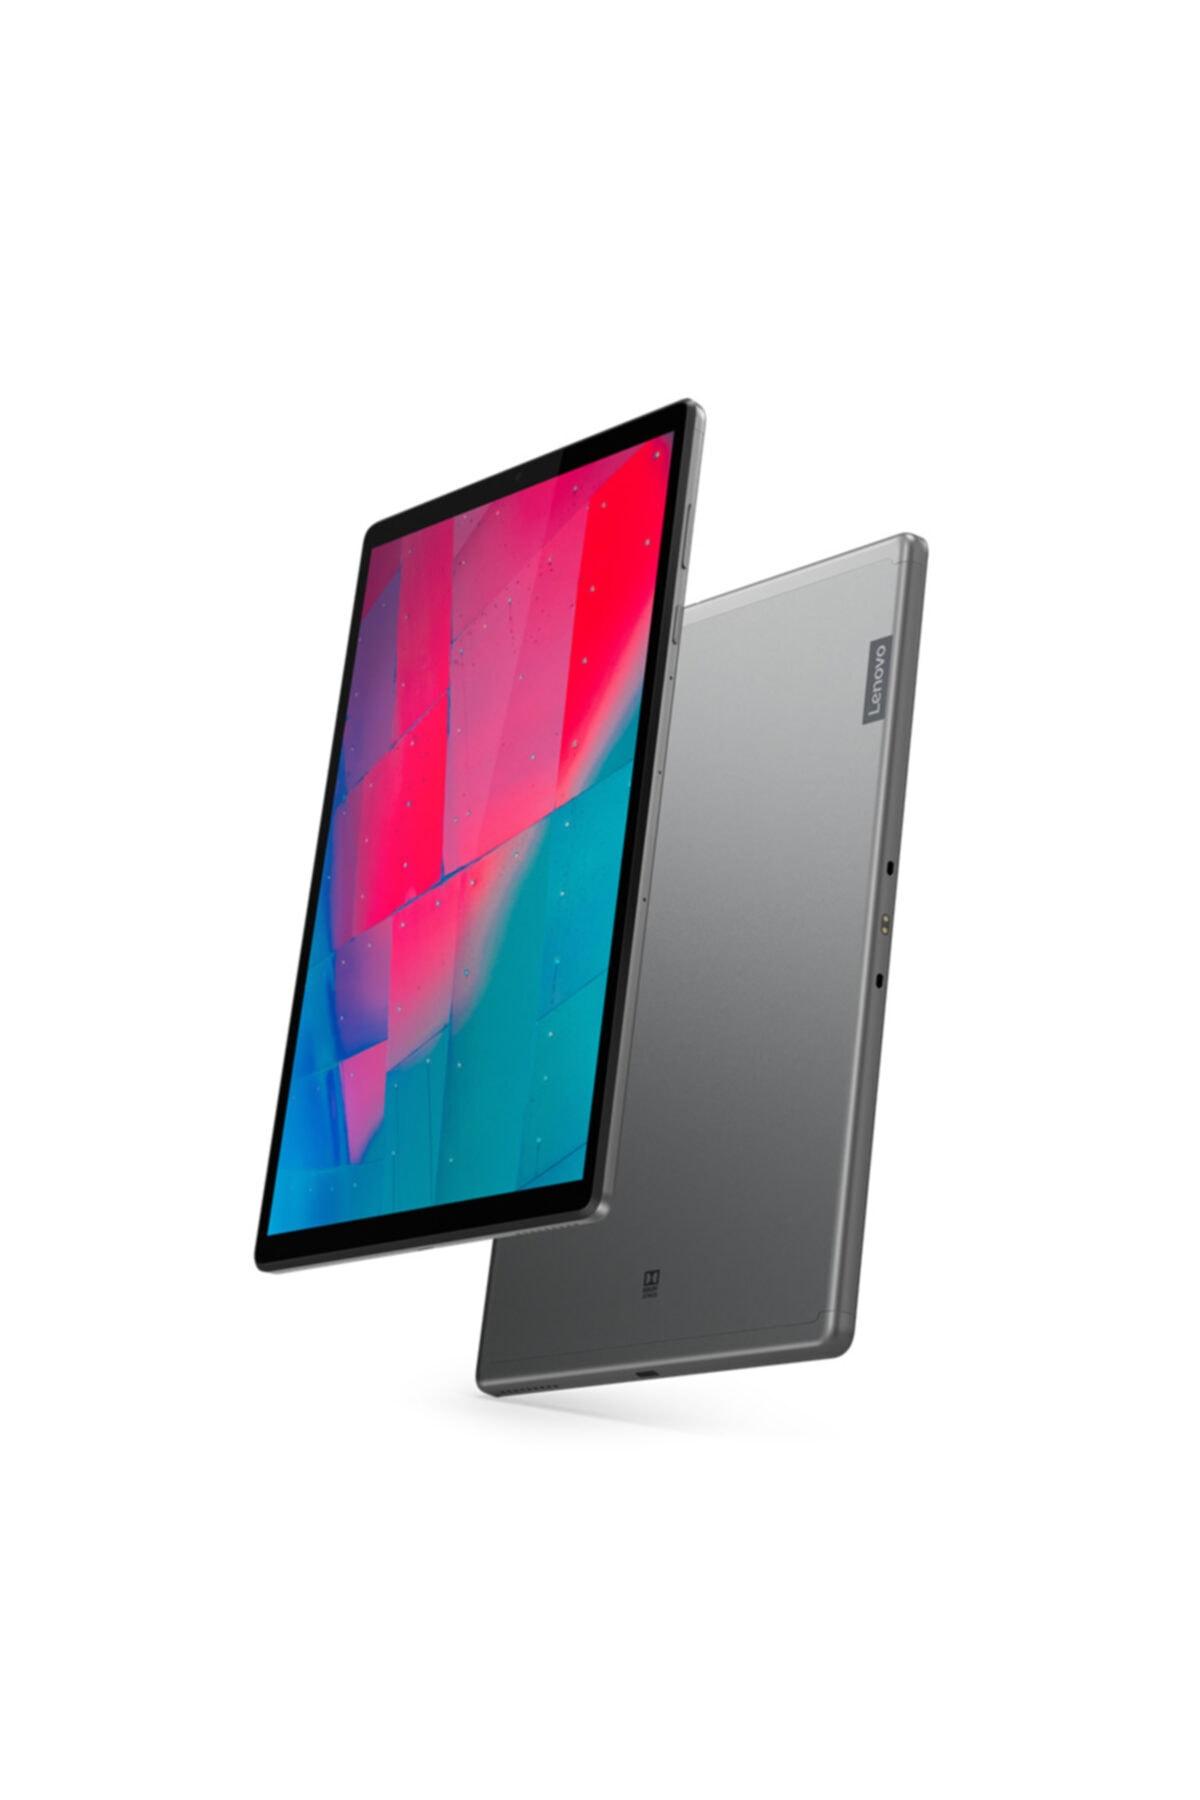 "LENOVO Tab M10 Fhd Plus Tb-x606f 4gb/128gb Wi-fi+bt 10.3"" Tablet Za5t0276tr"